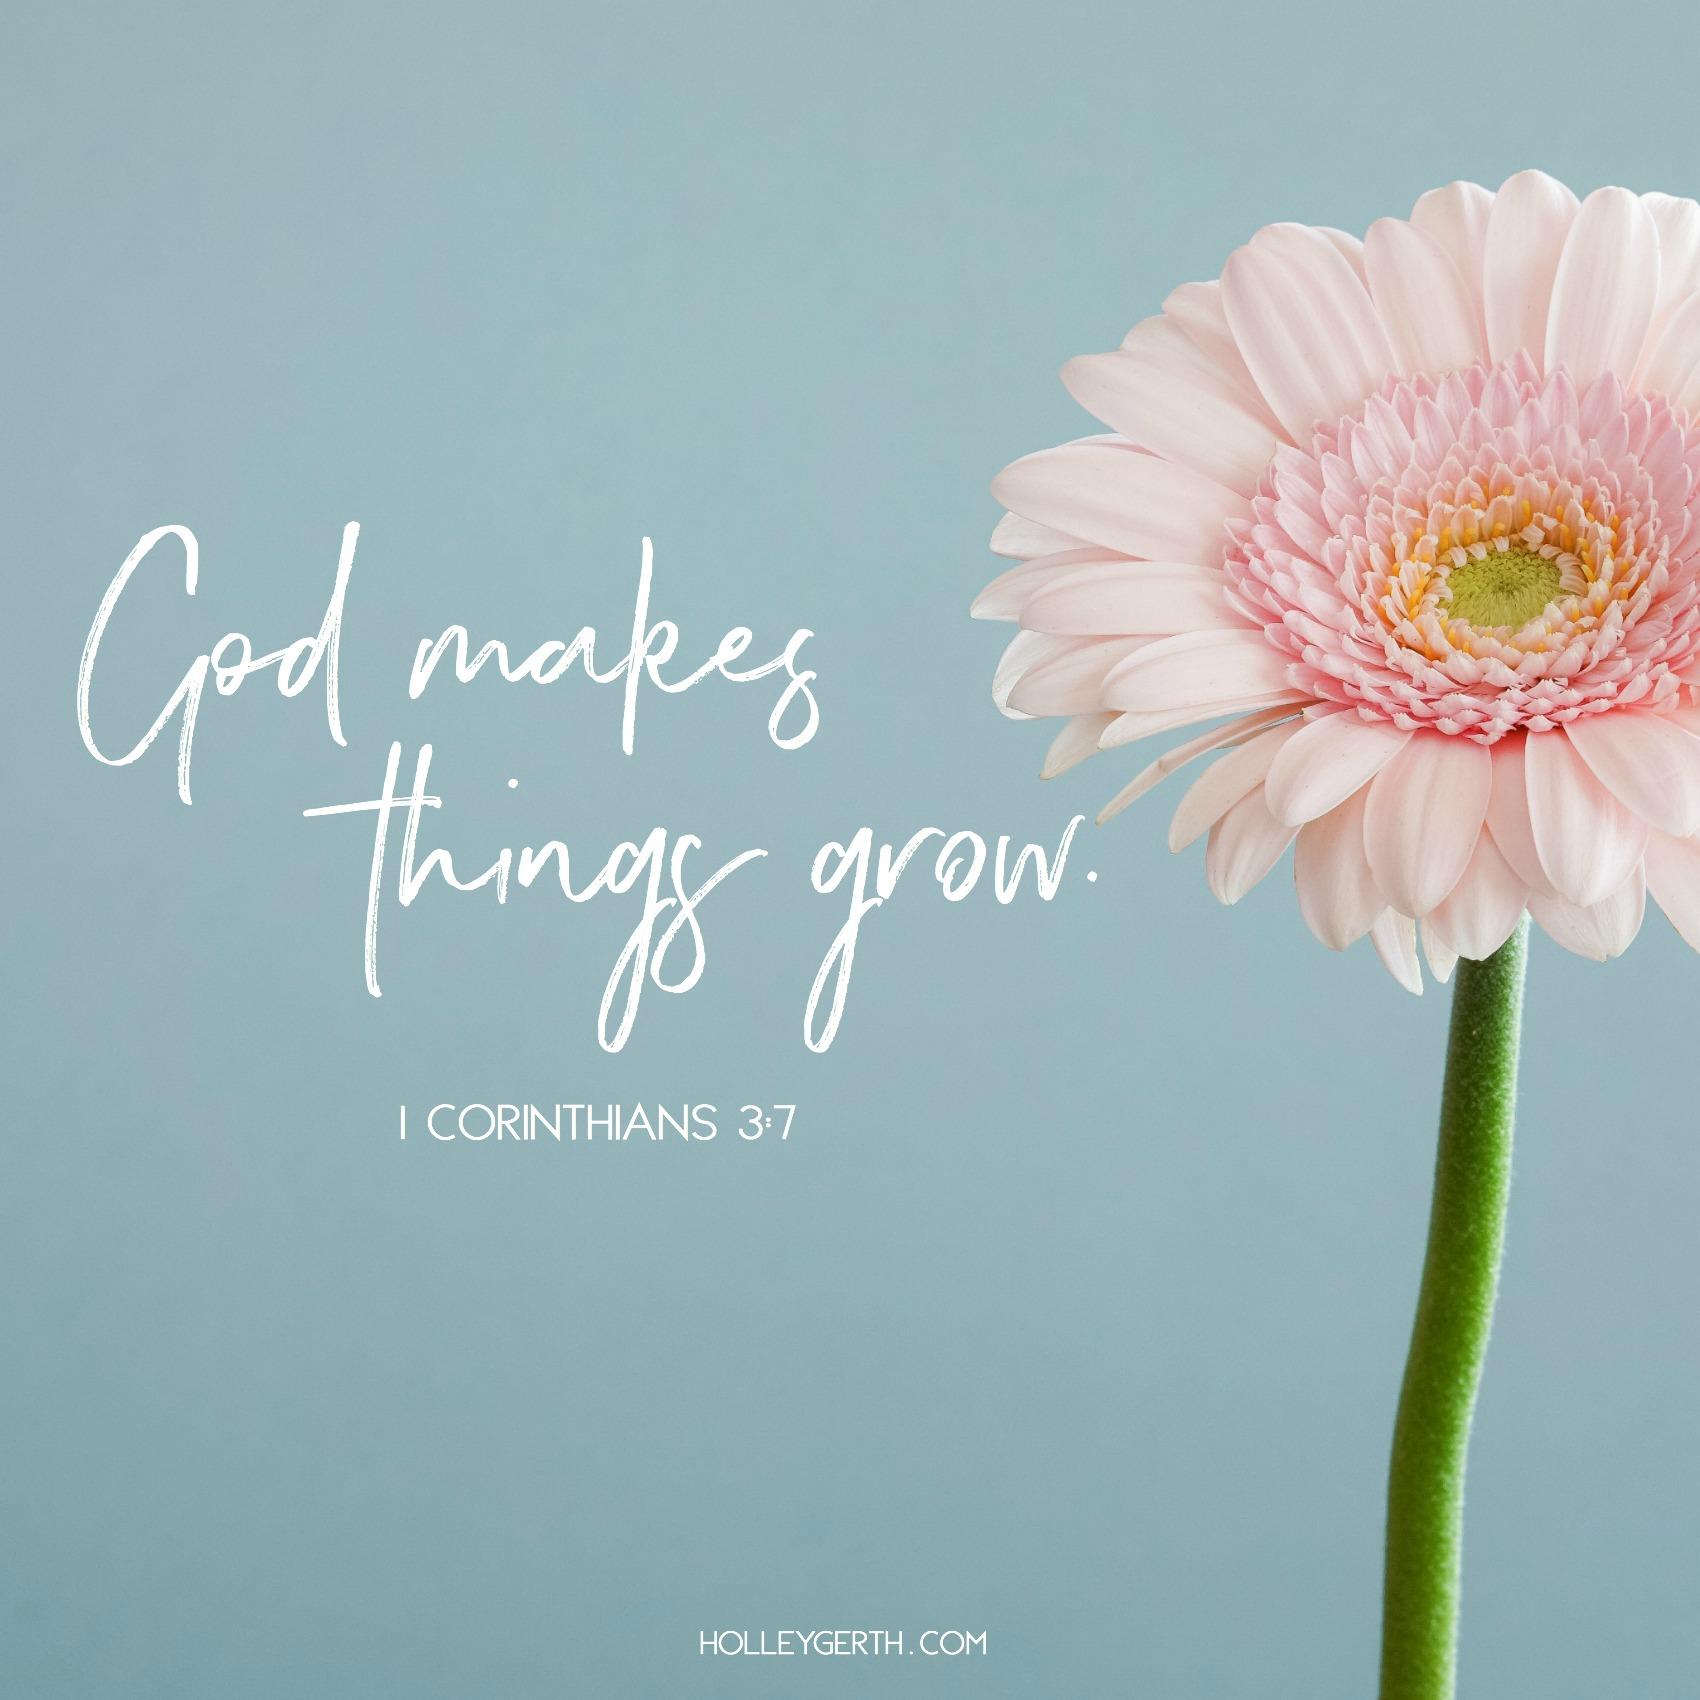 God makes things grow. 1 Corinthians 3:7